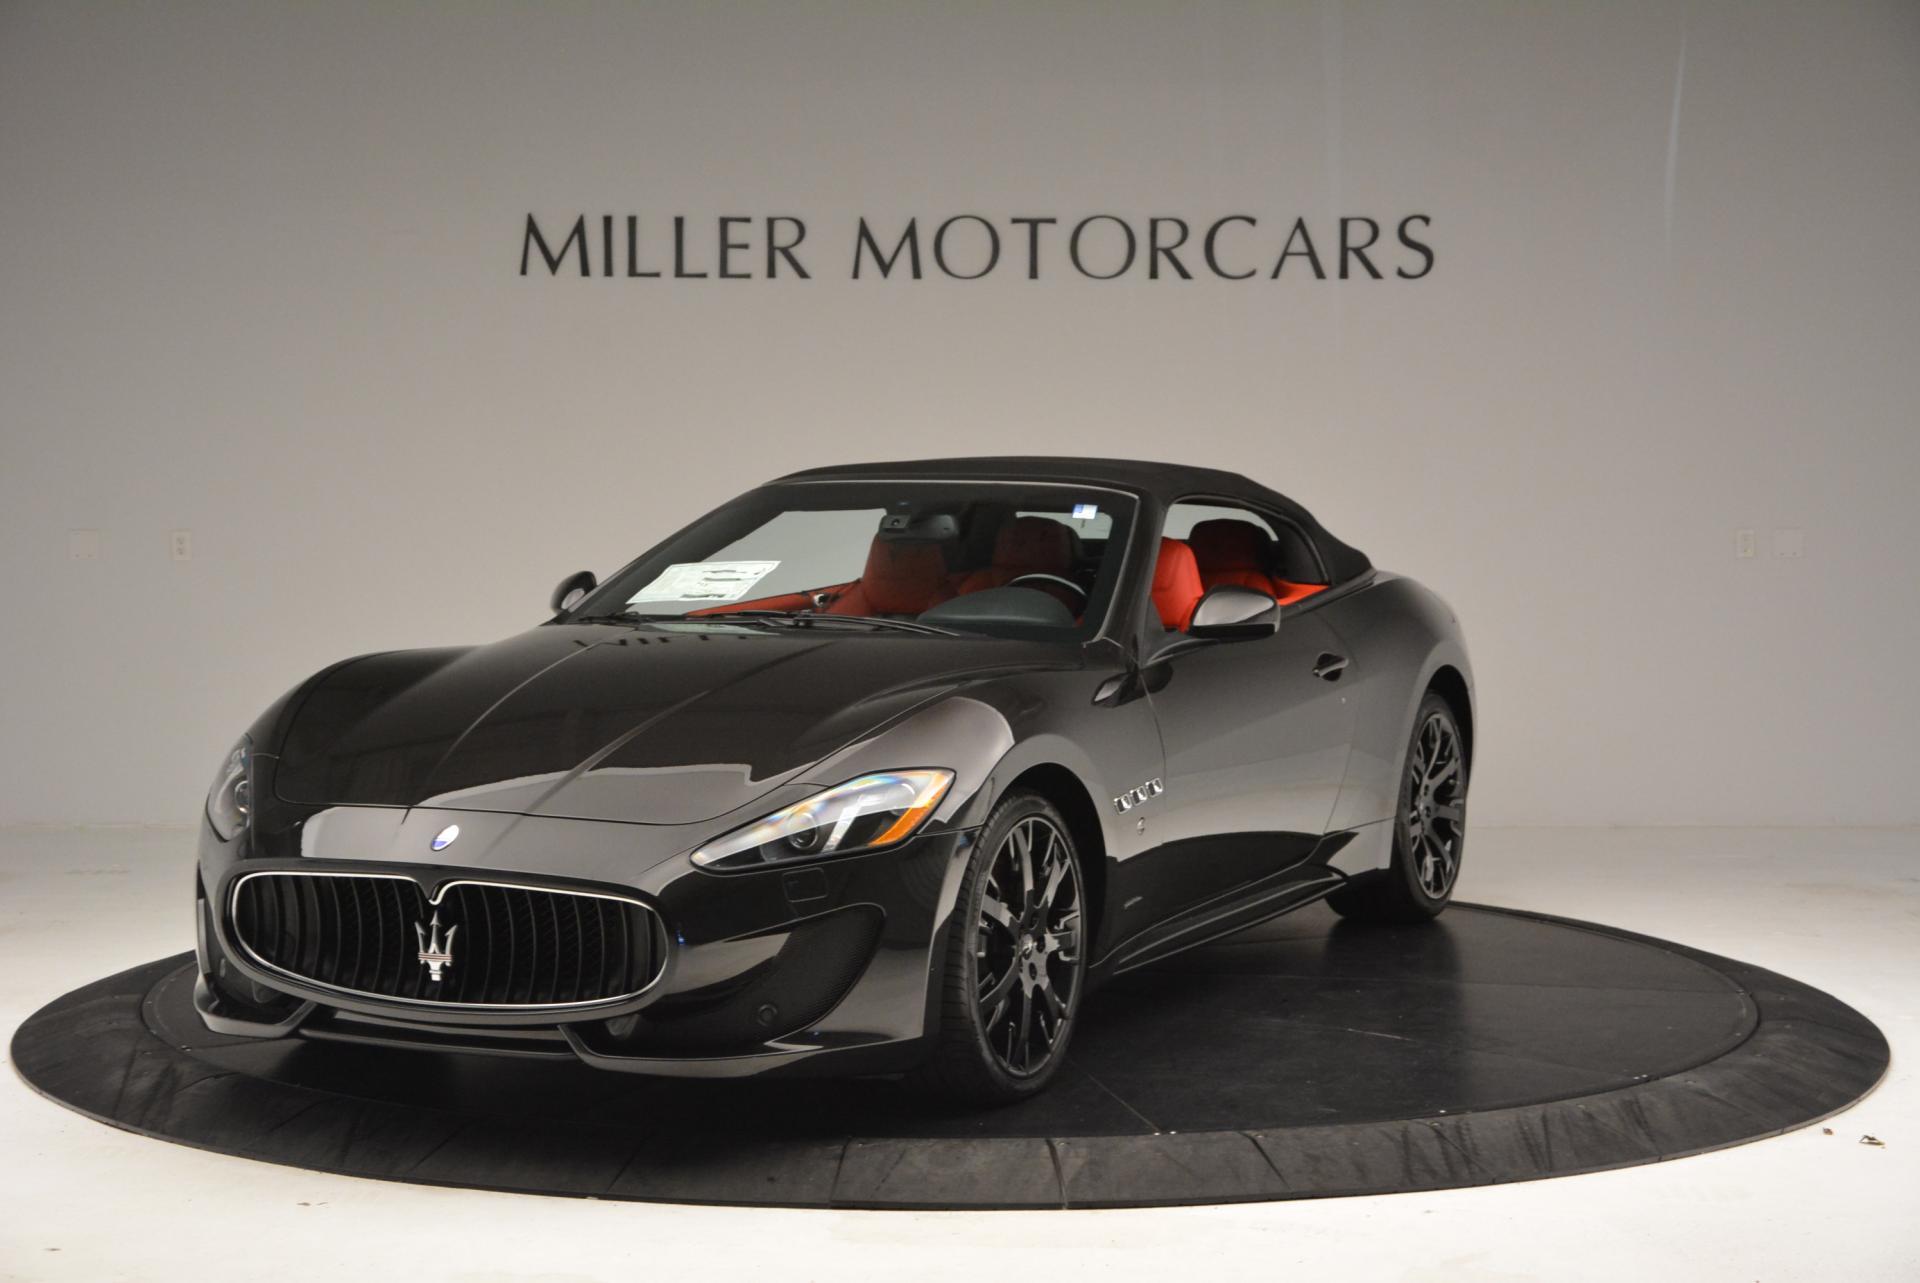 New 2016 Maserati GranTurismo Convertible Sport For Sale In Westport, CT 155_p2